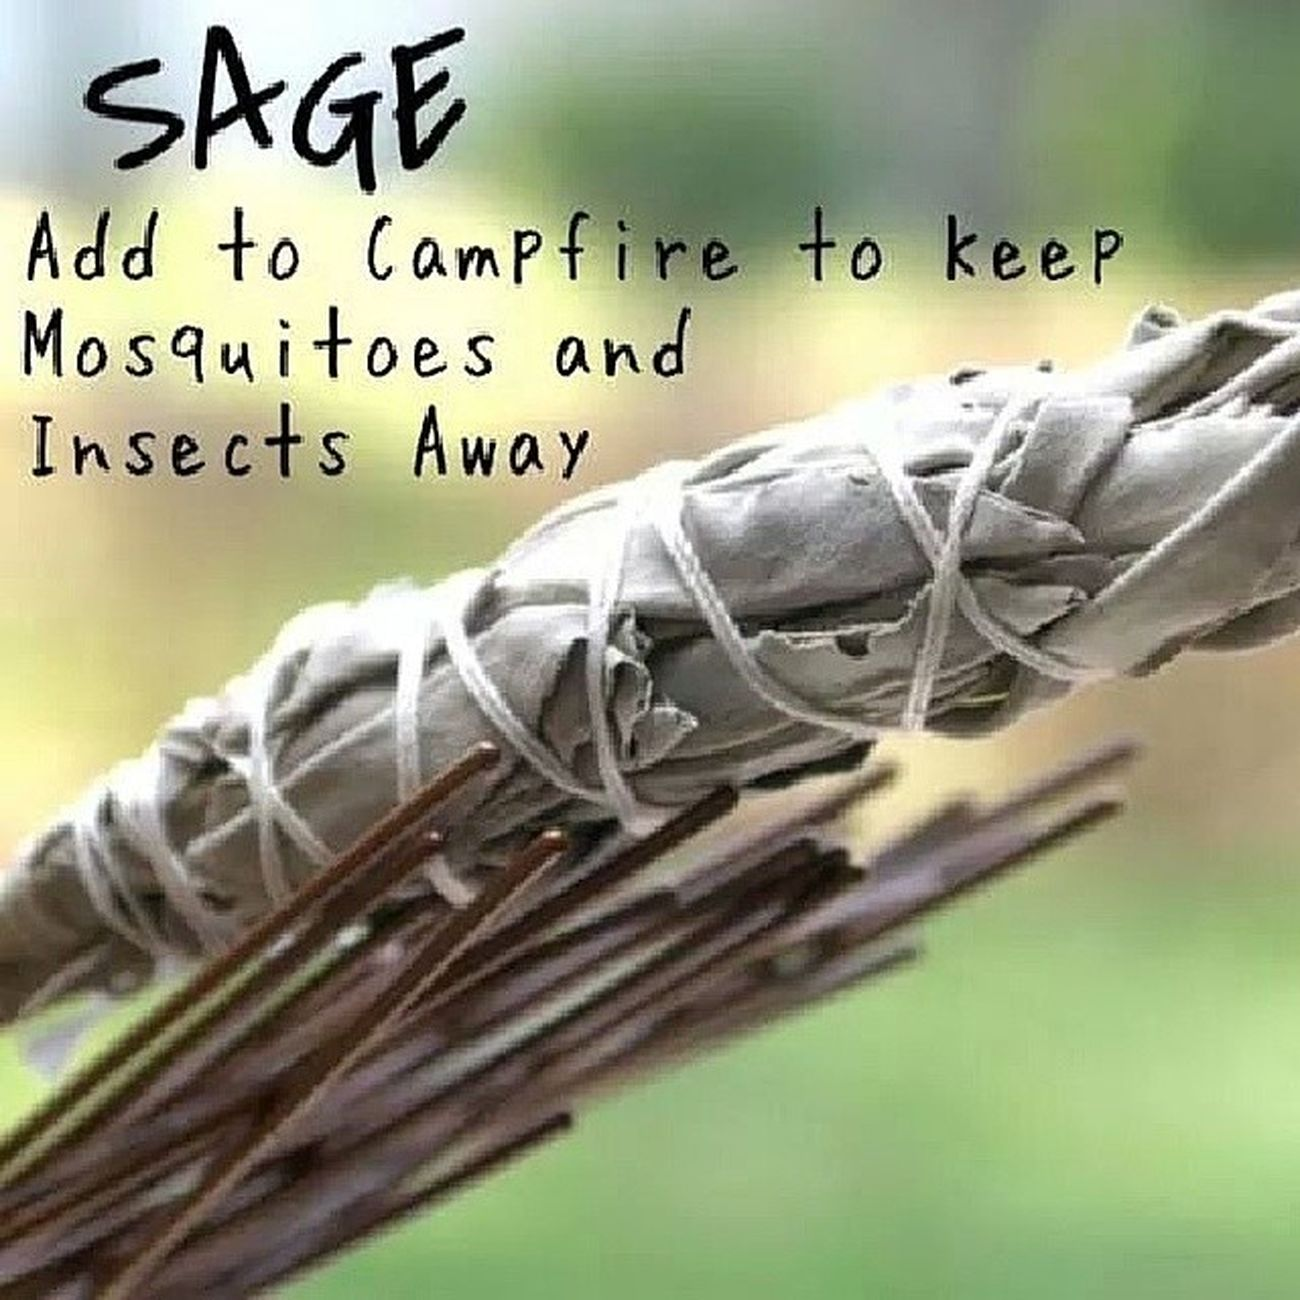 Camping Campingideas Sage Naturalherb healing spiritual naturalremedy mosquitos insects repellant goodidea